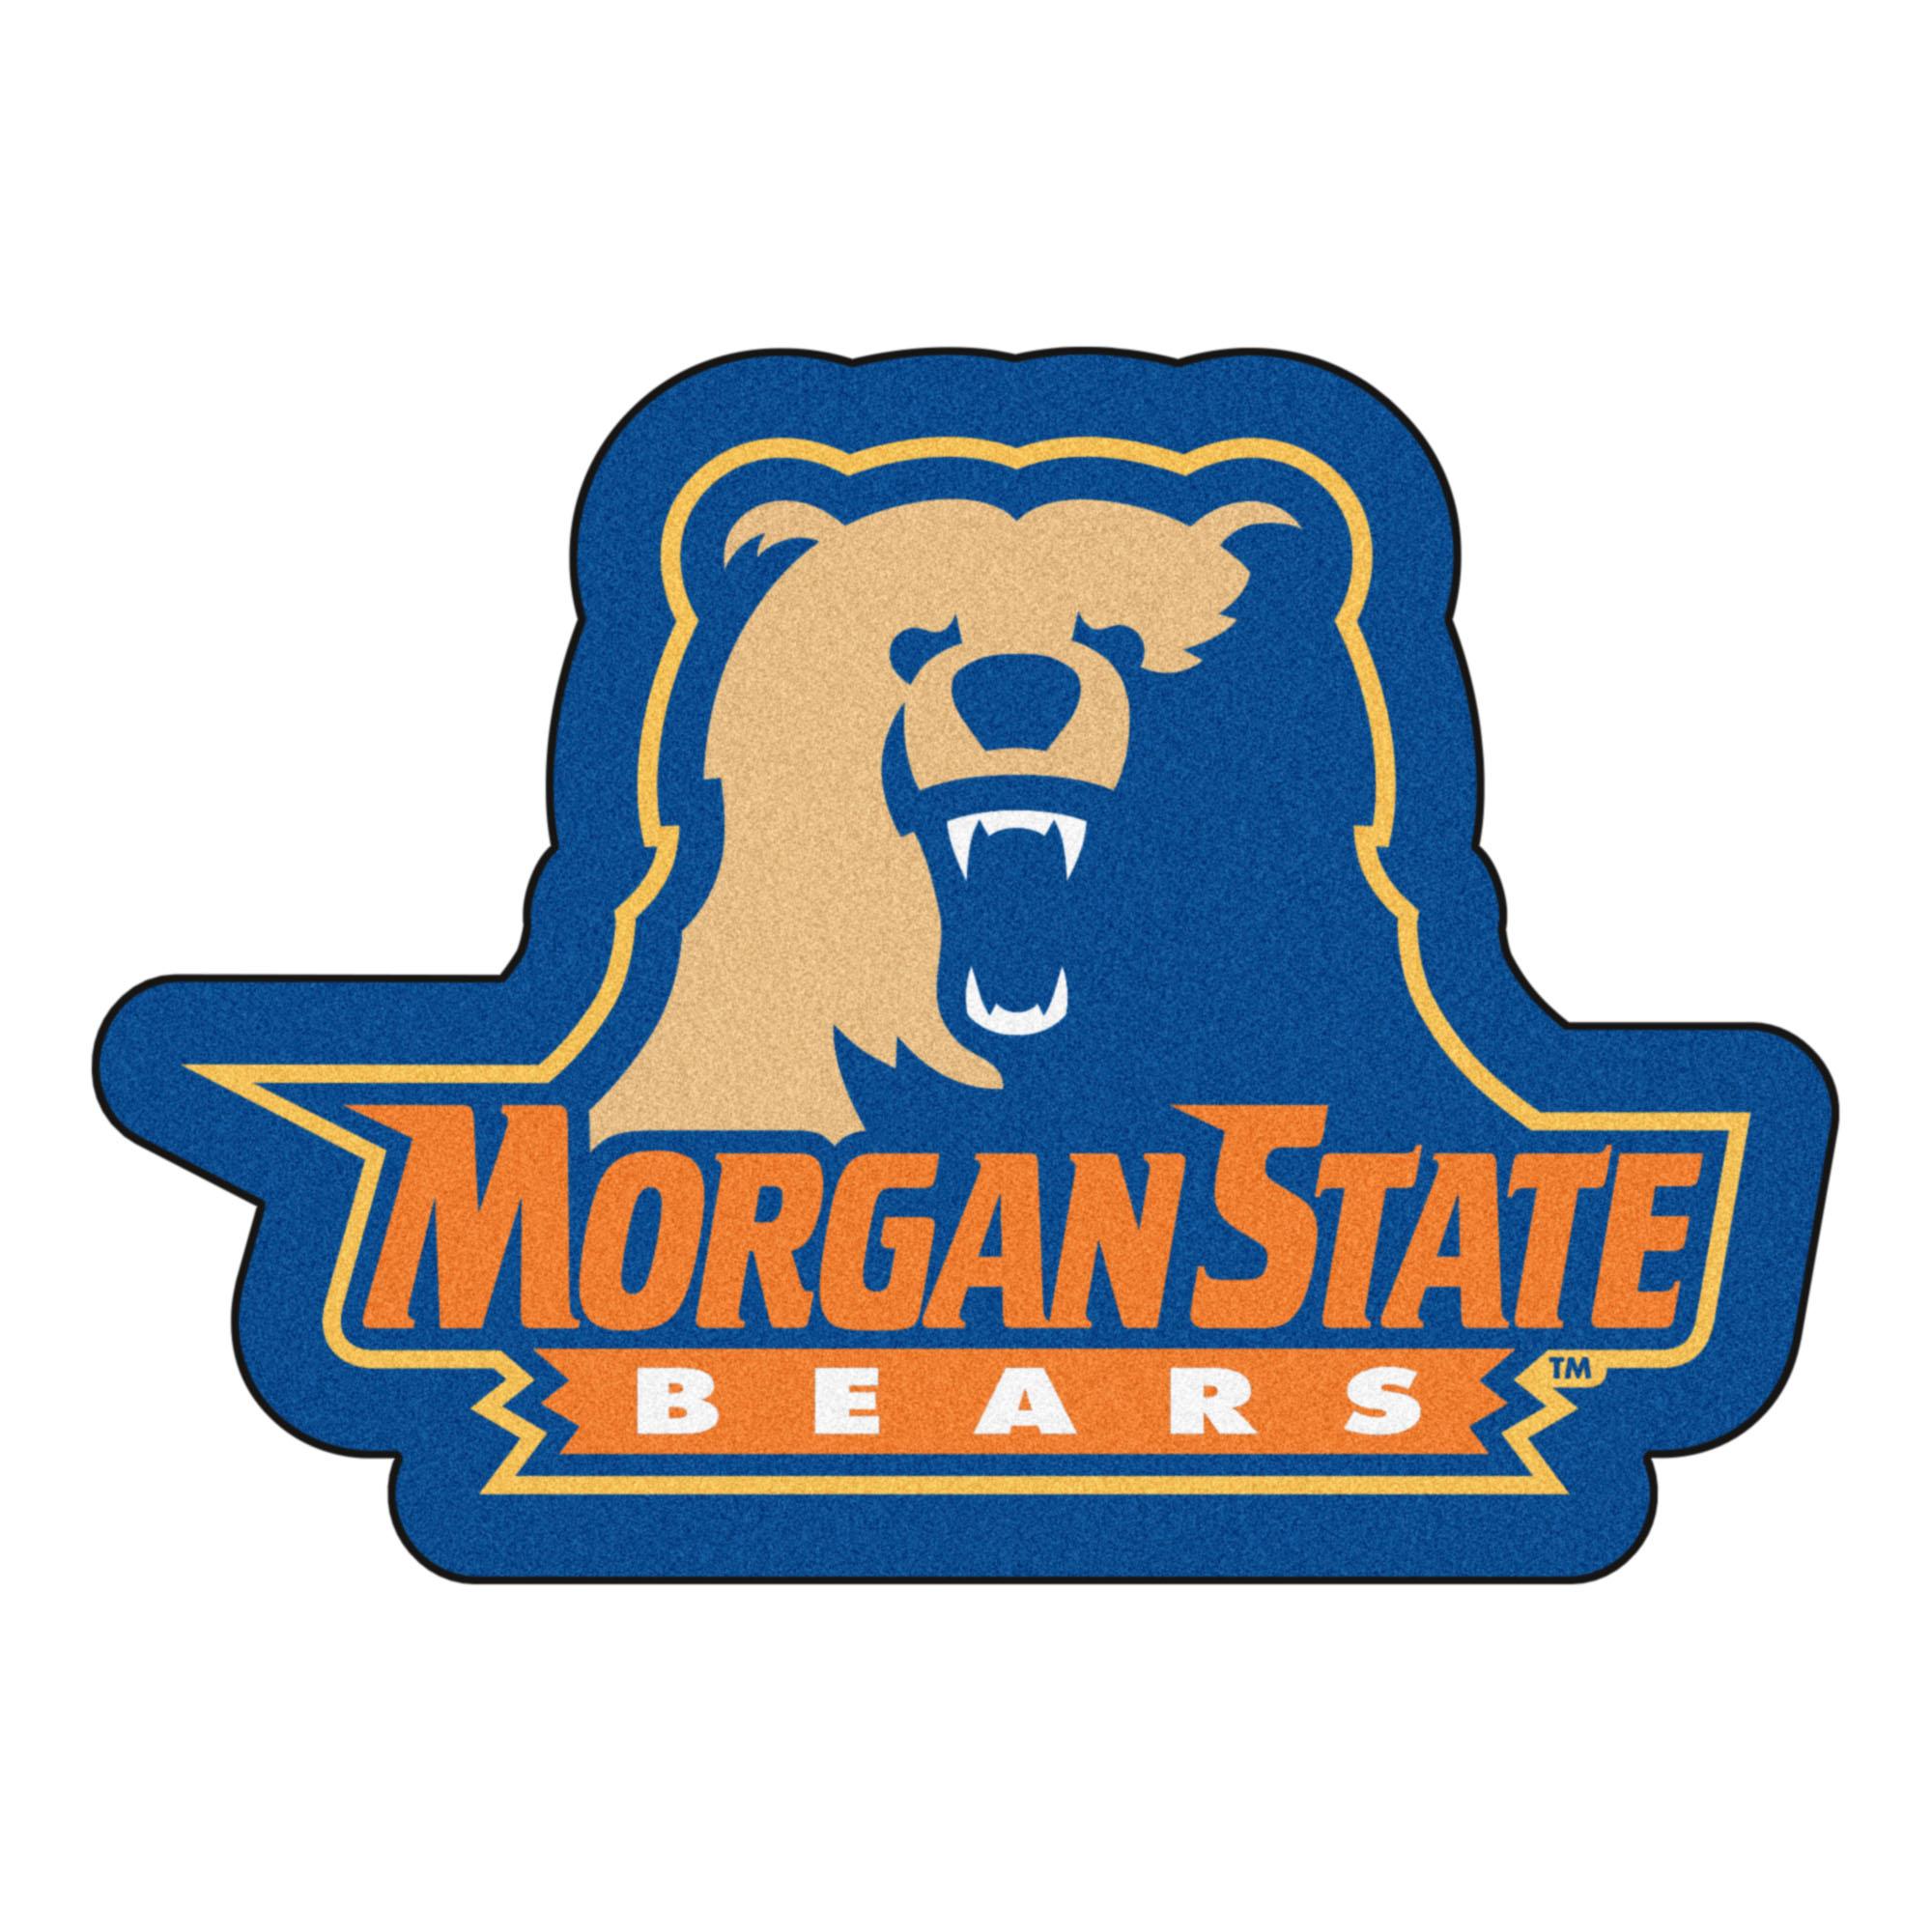 Morgan State University Bears Mascot Area Rug Nylon